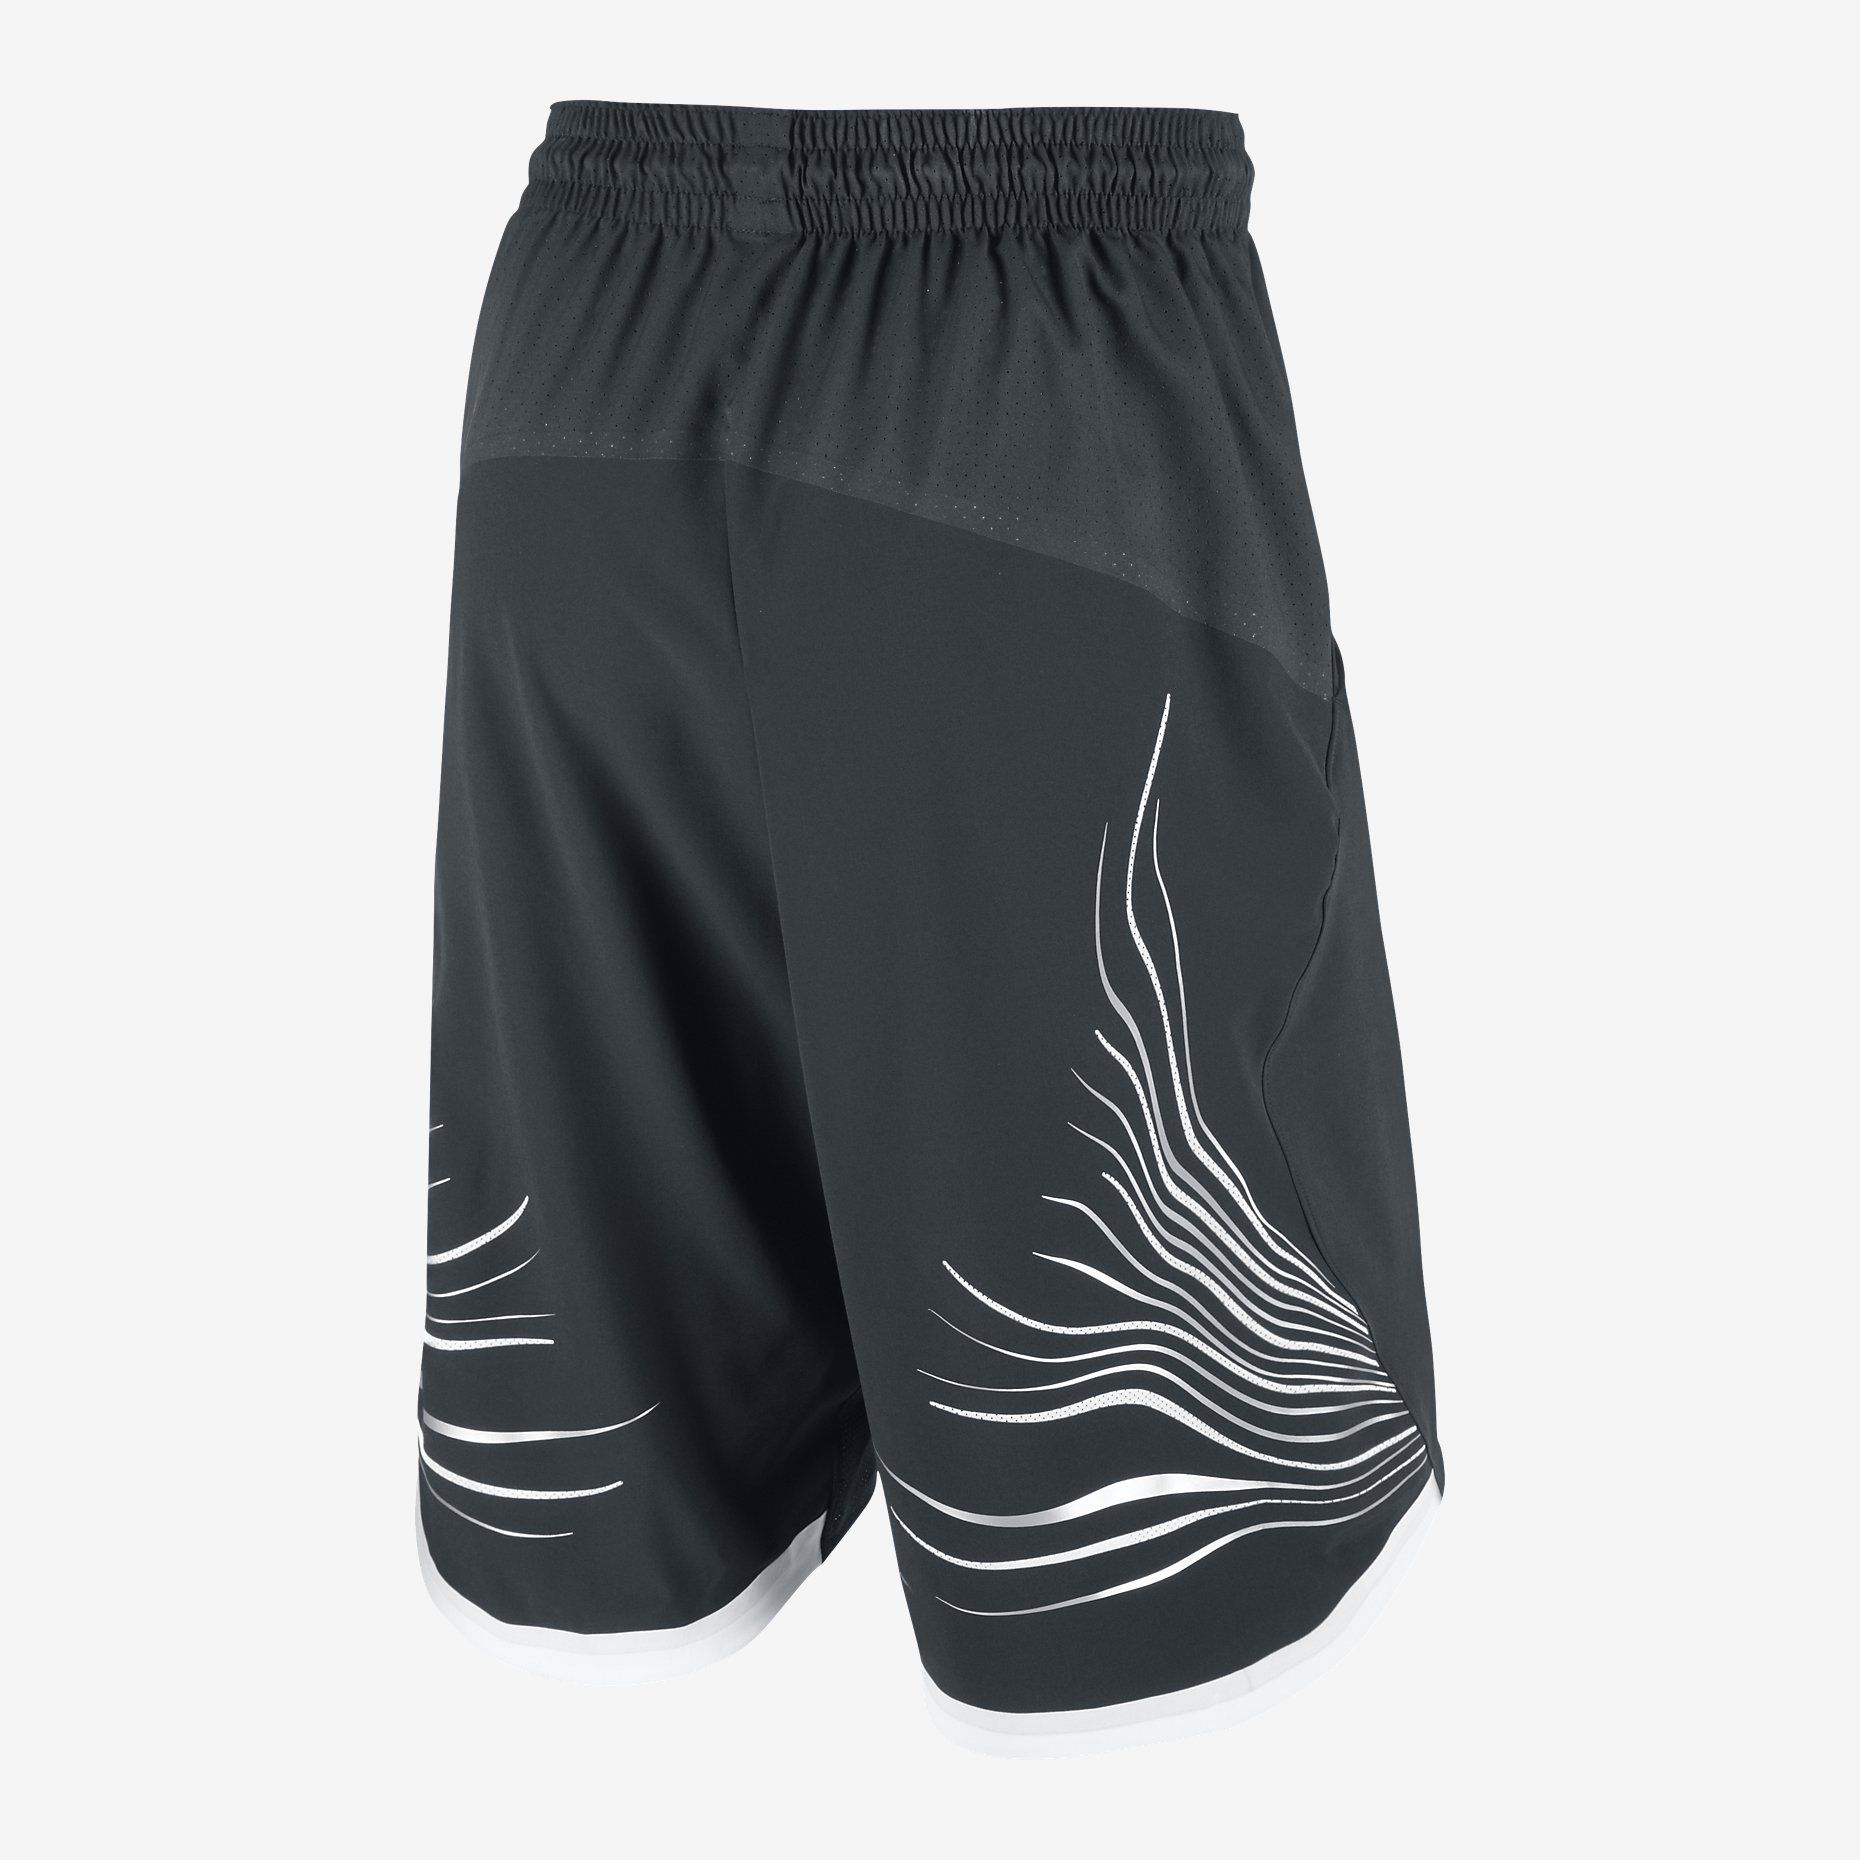 Jordan aj woven mens basketball shorts nike store